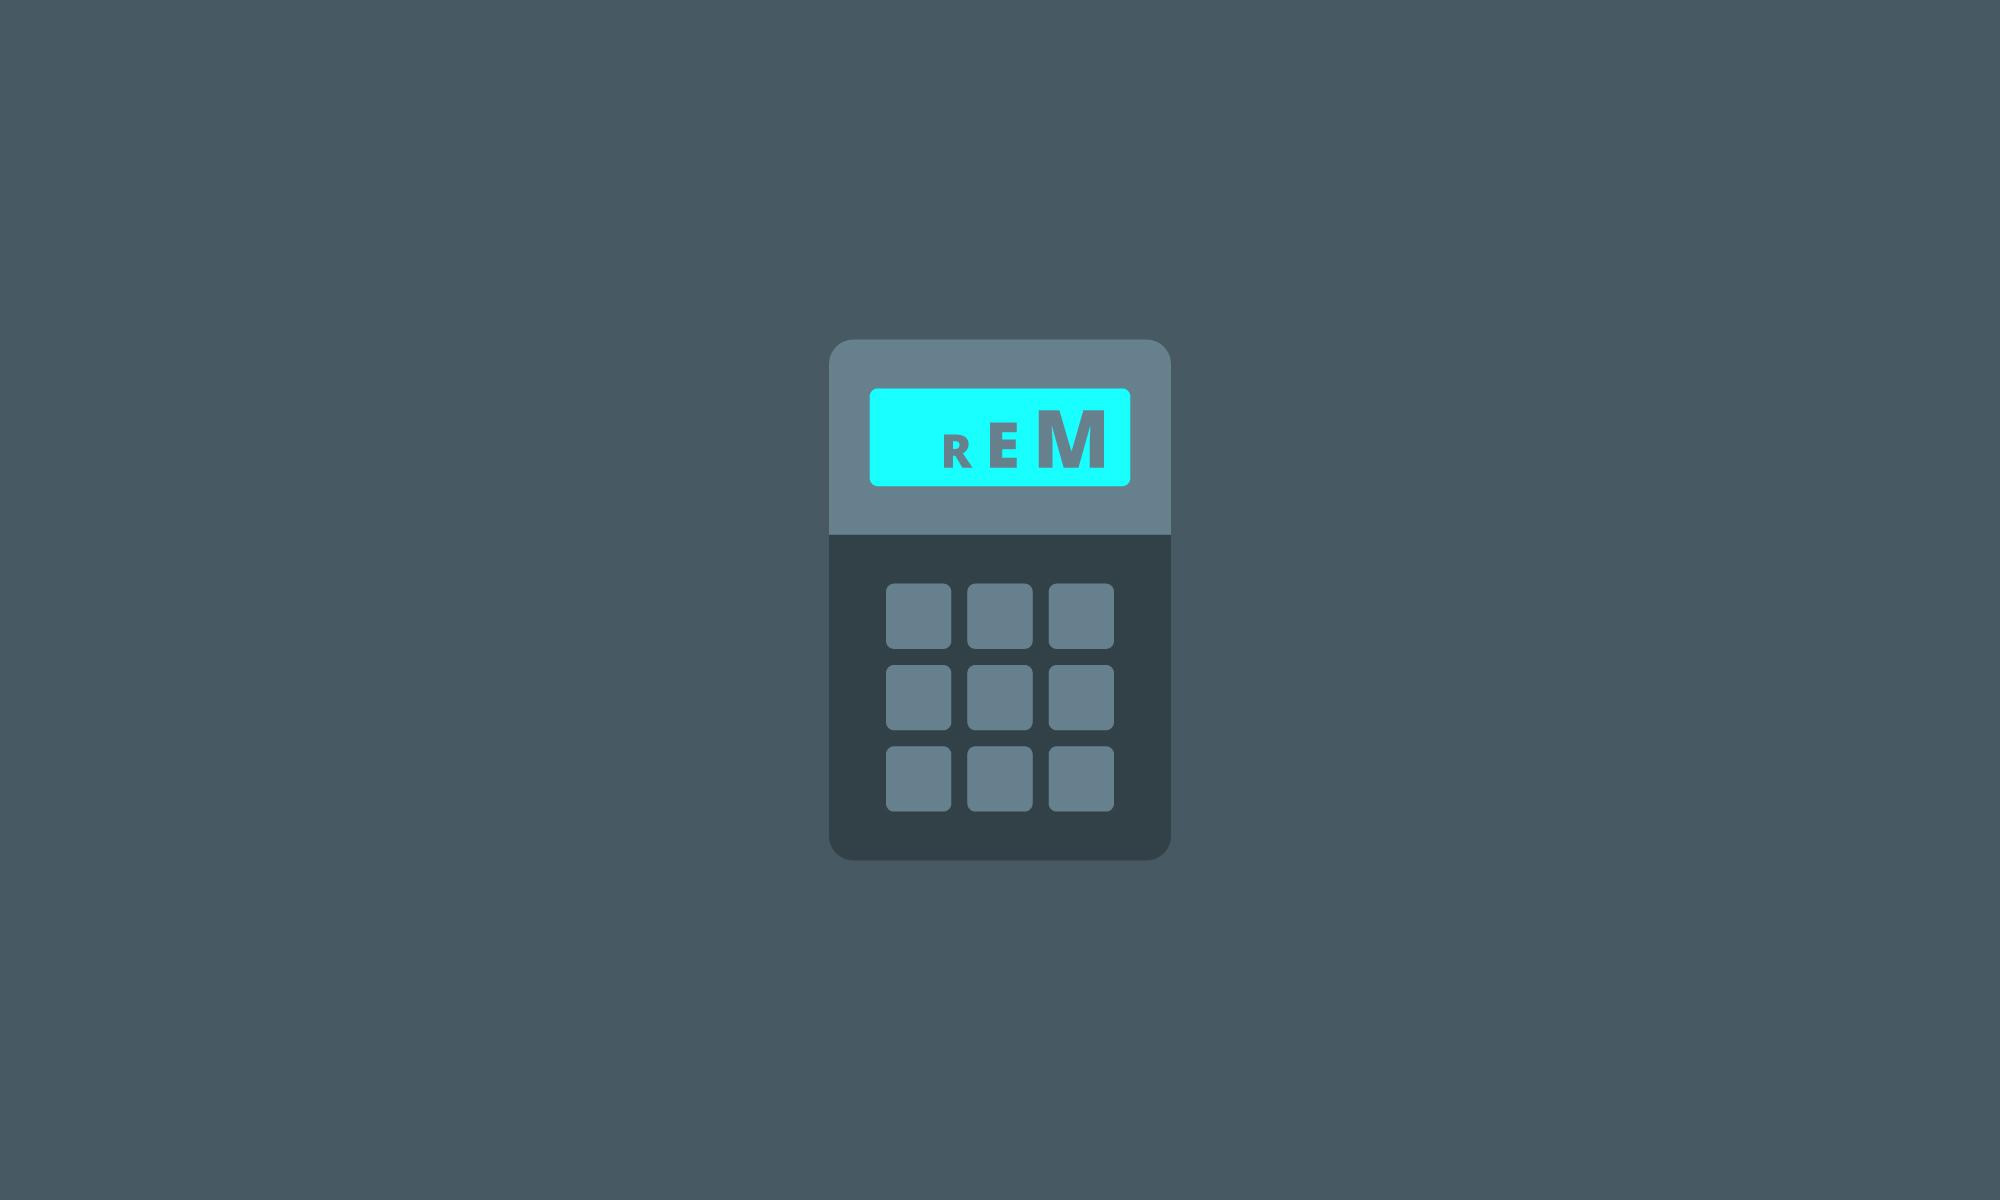 REM Calculator